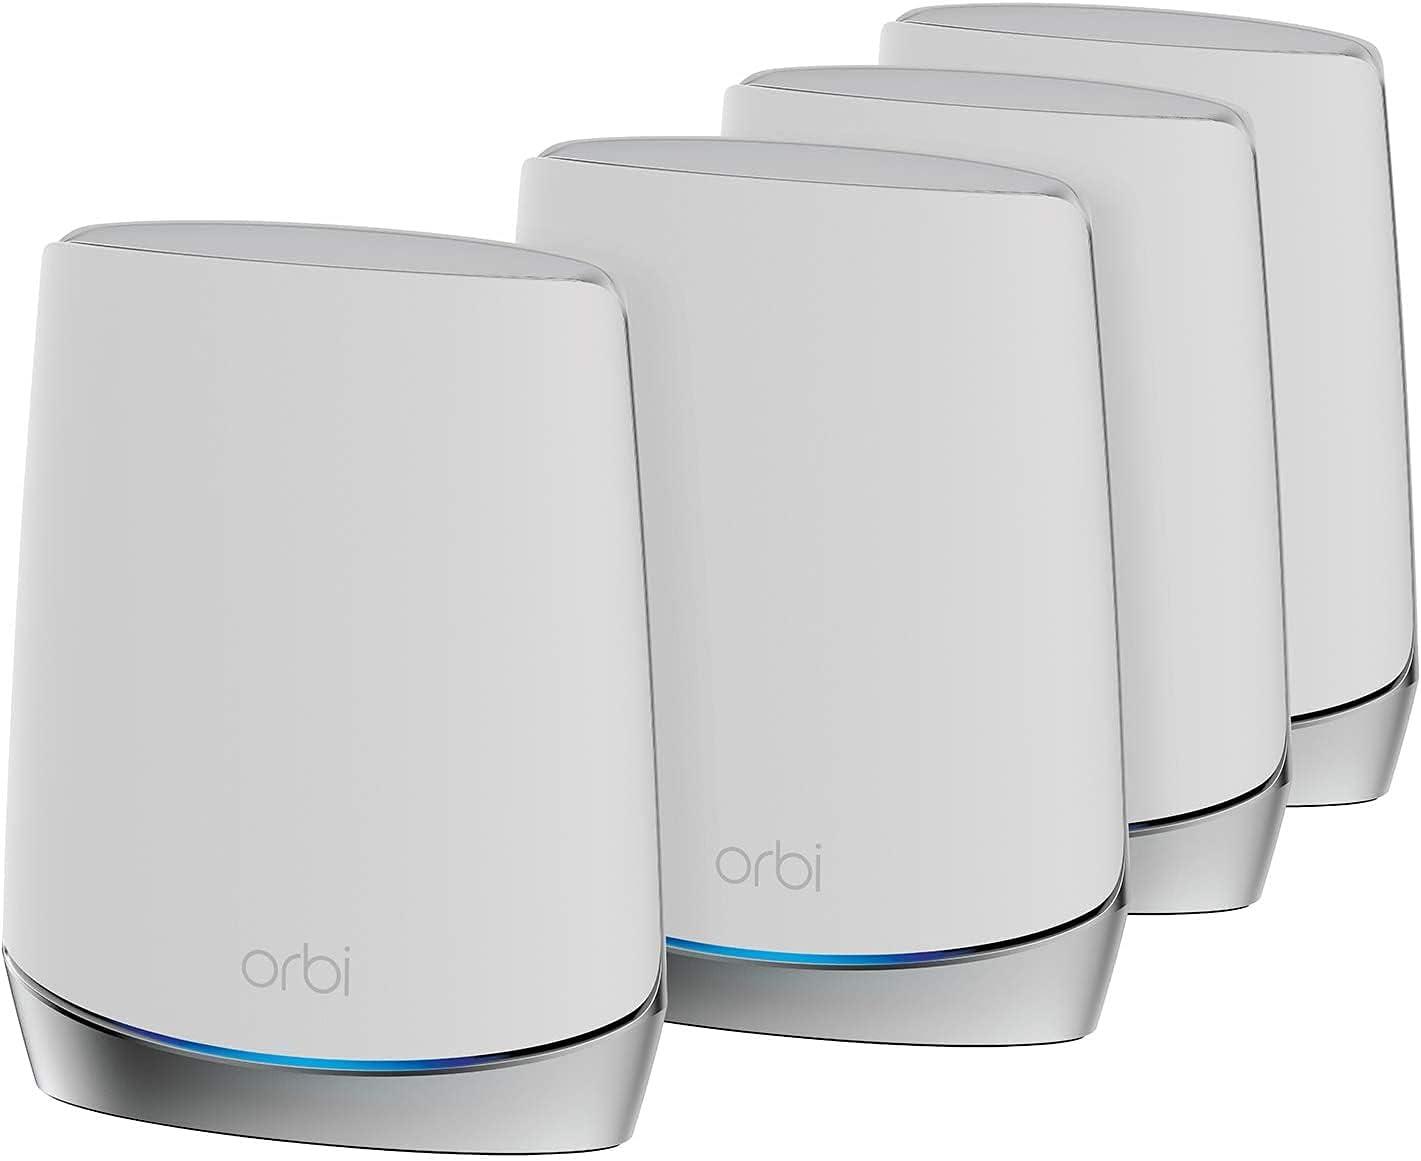 NETGEAR Système WiFi 6 Mesh Tri Bandes Orbi (RBK754), Pack de 4,...